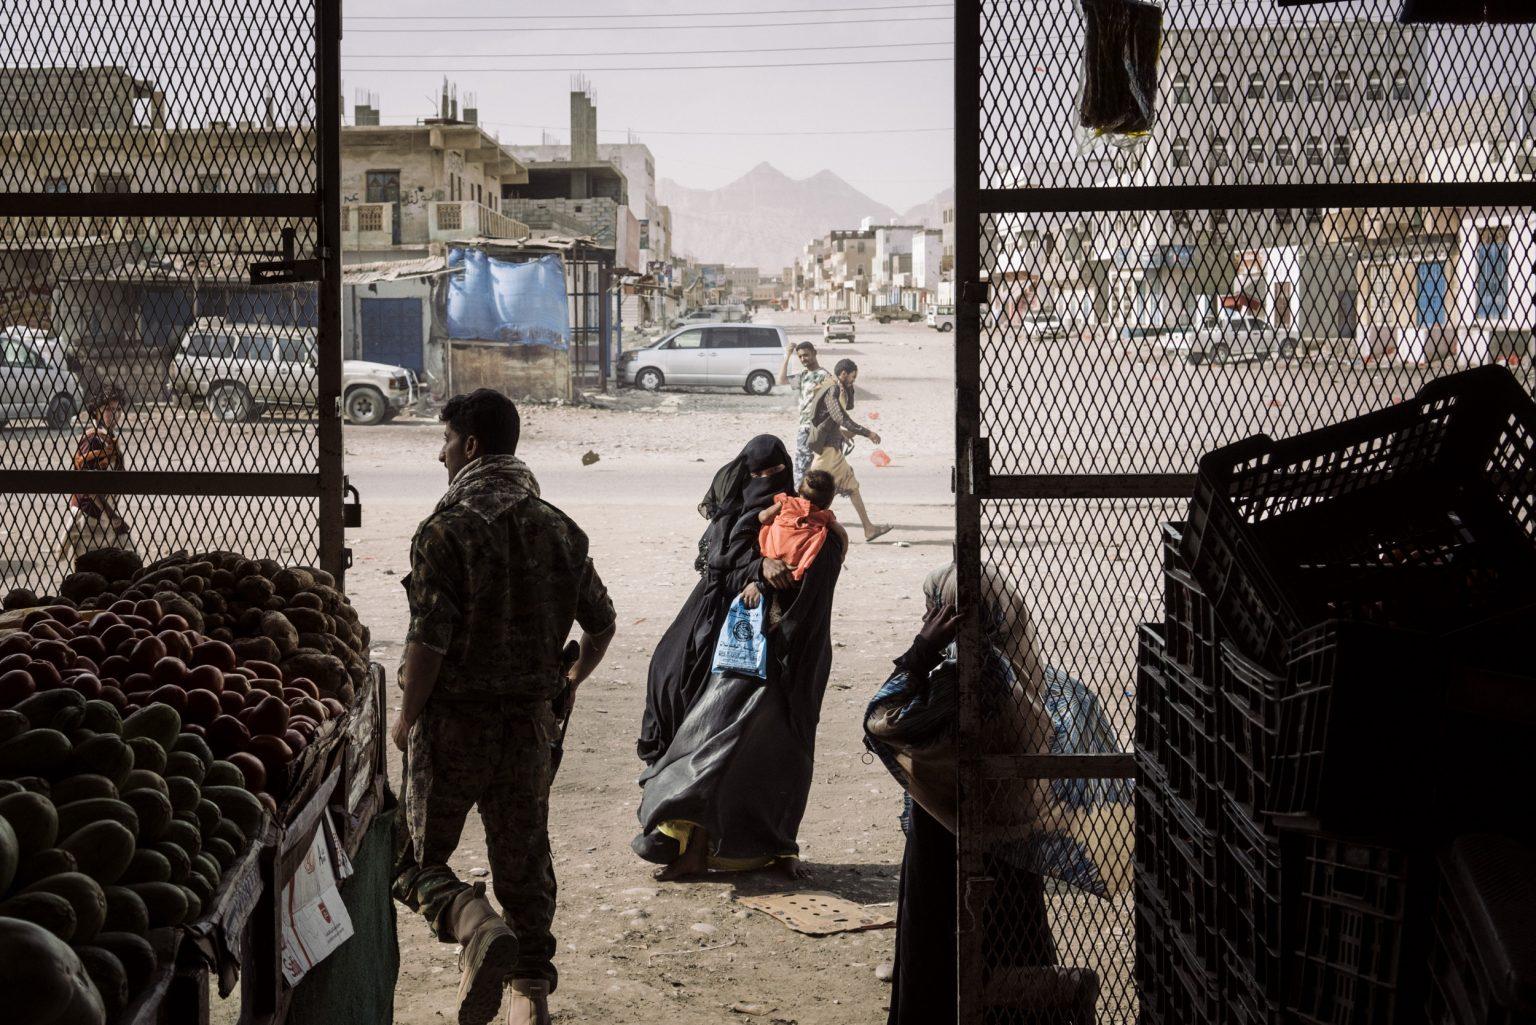 yemen-crisis-la-crisi-nello-yemen